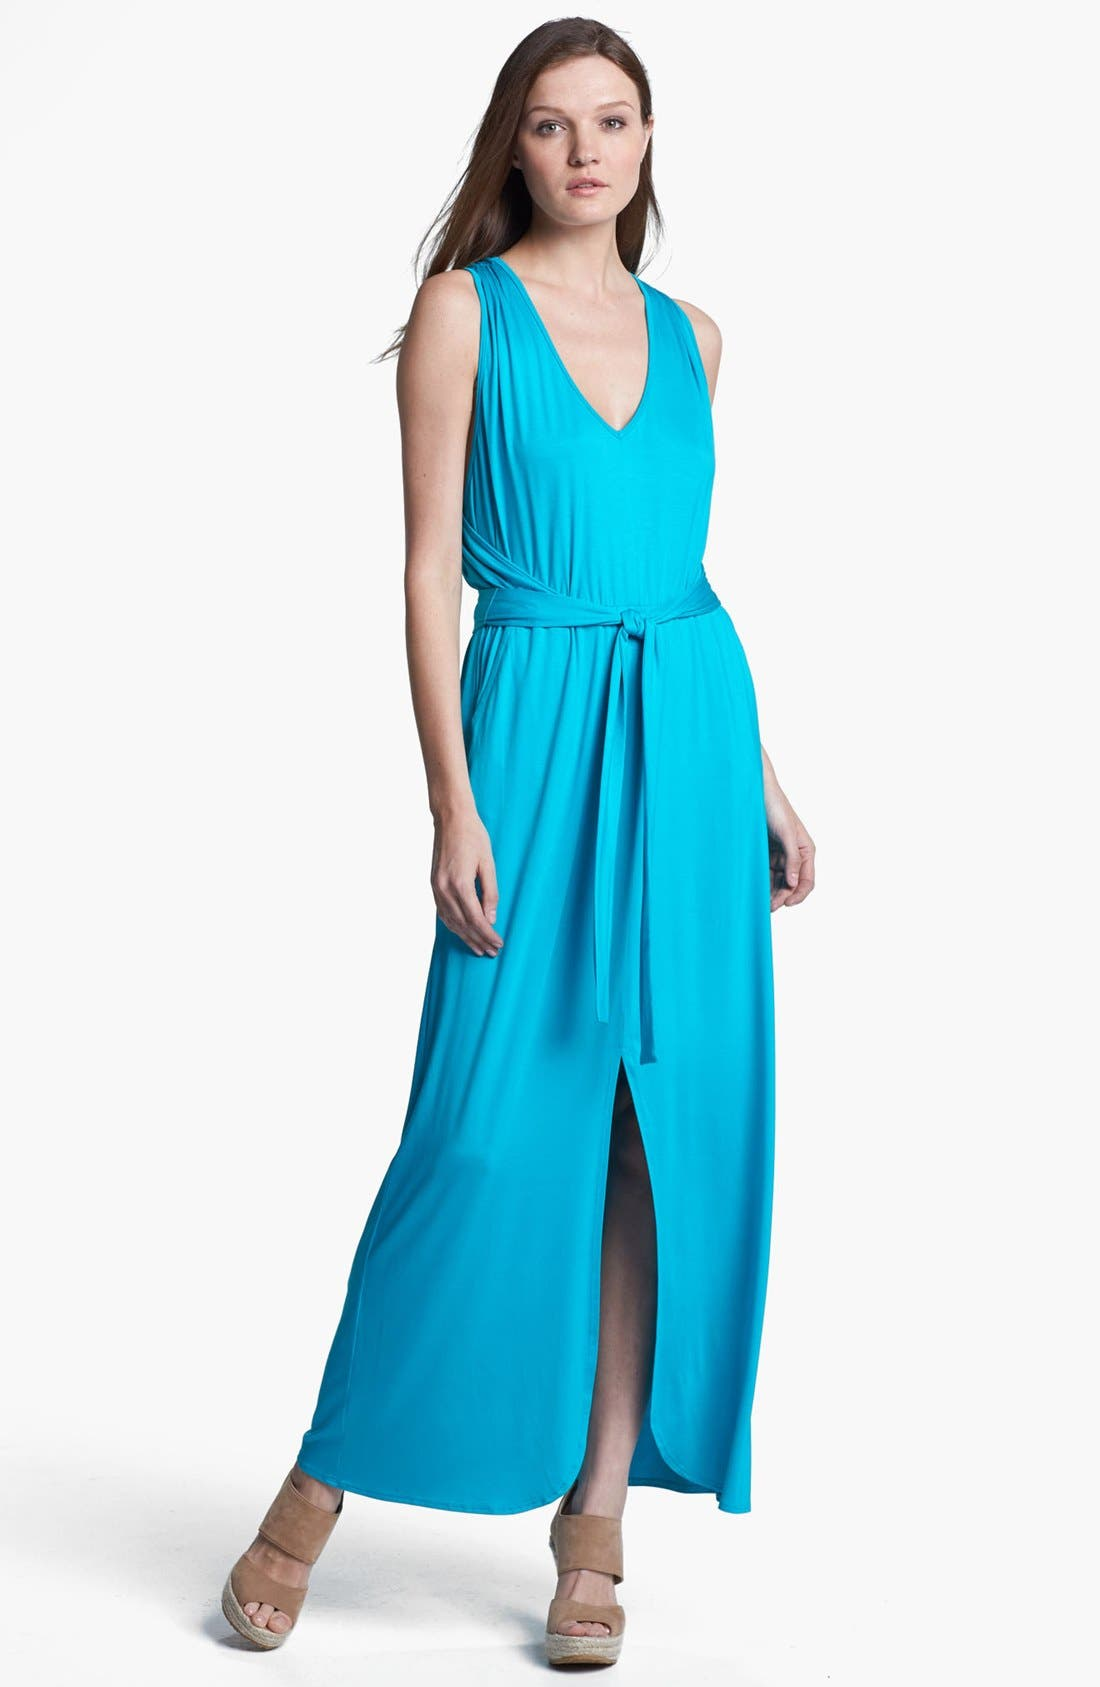 Alternate Image 1 Selected - Trina Turk 'Leandra' Belted Stretch Maxi Dress